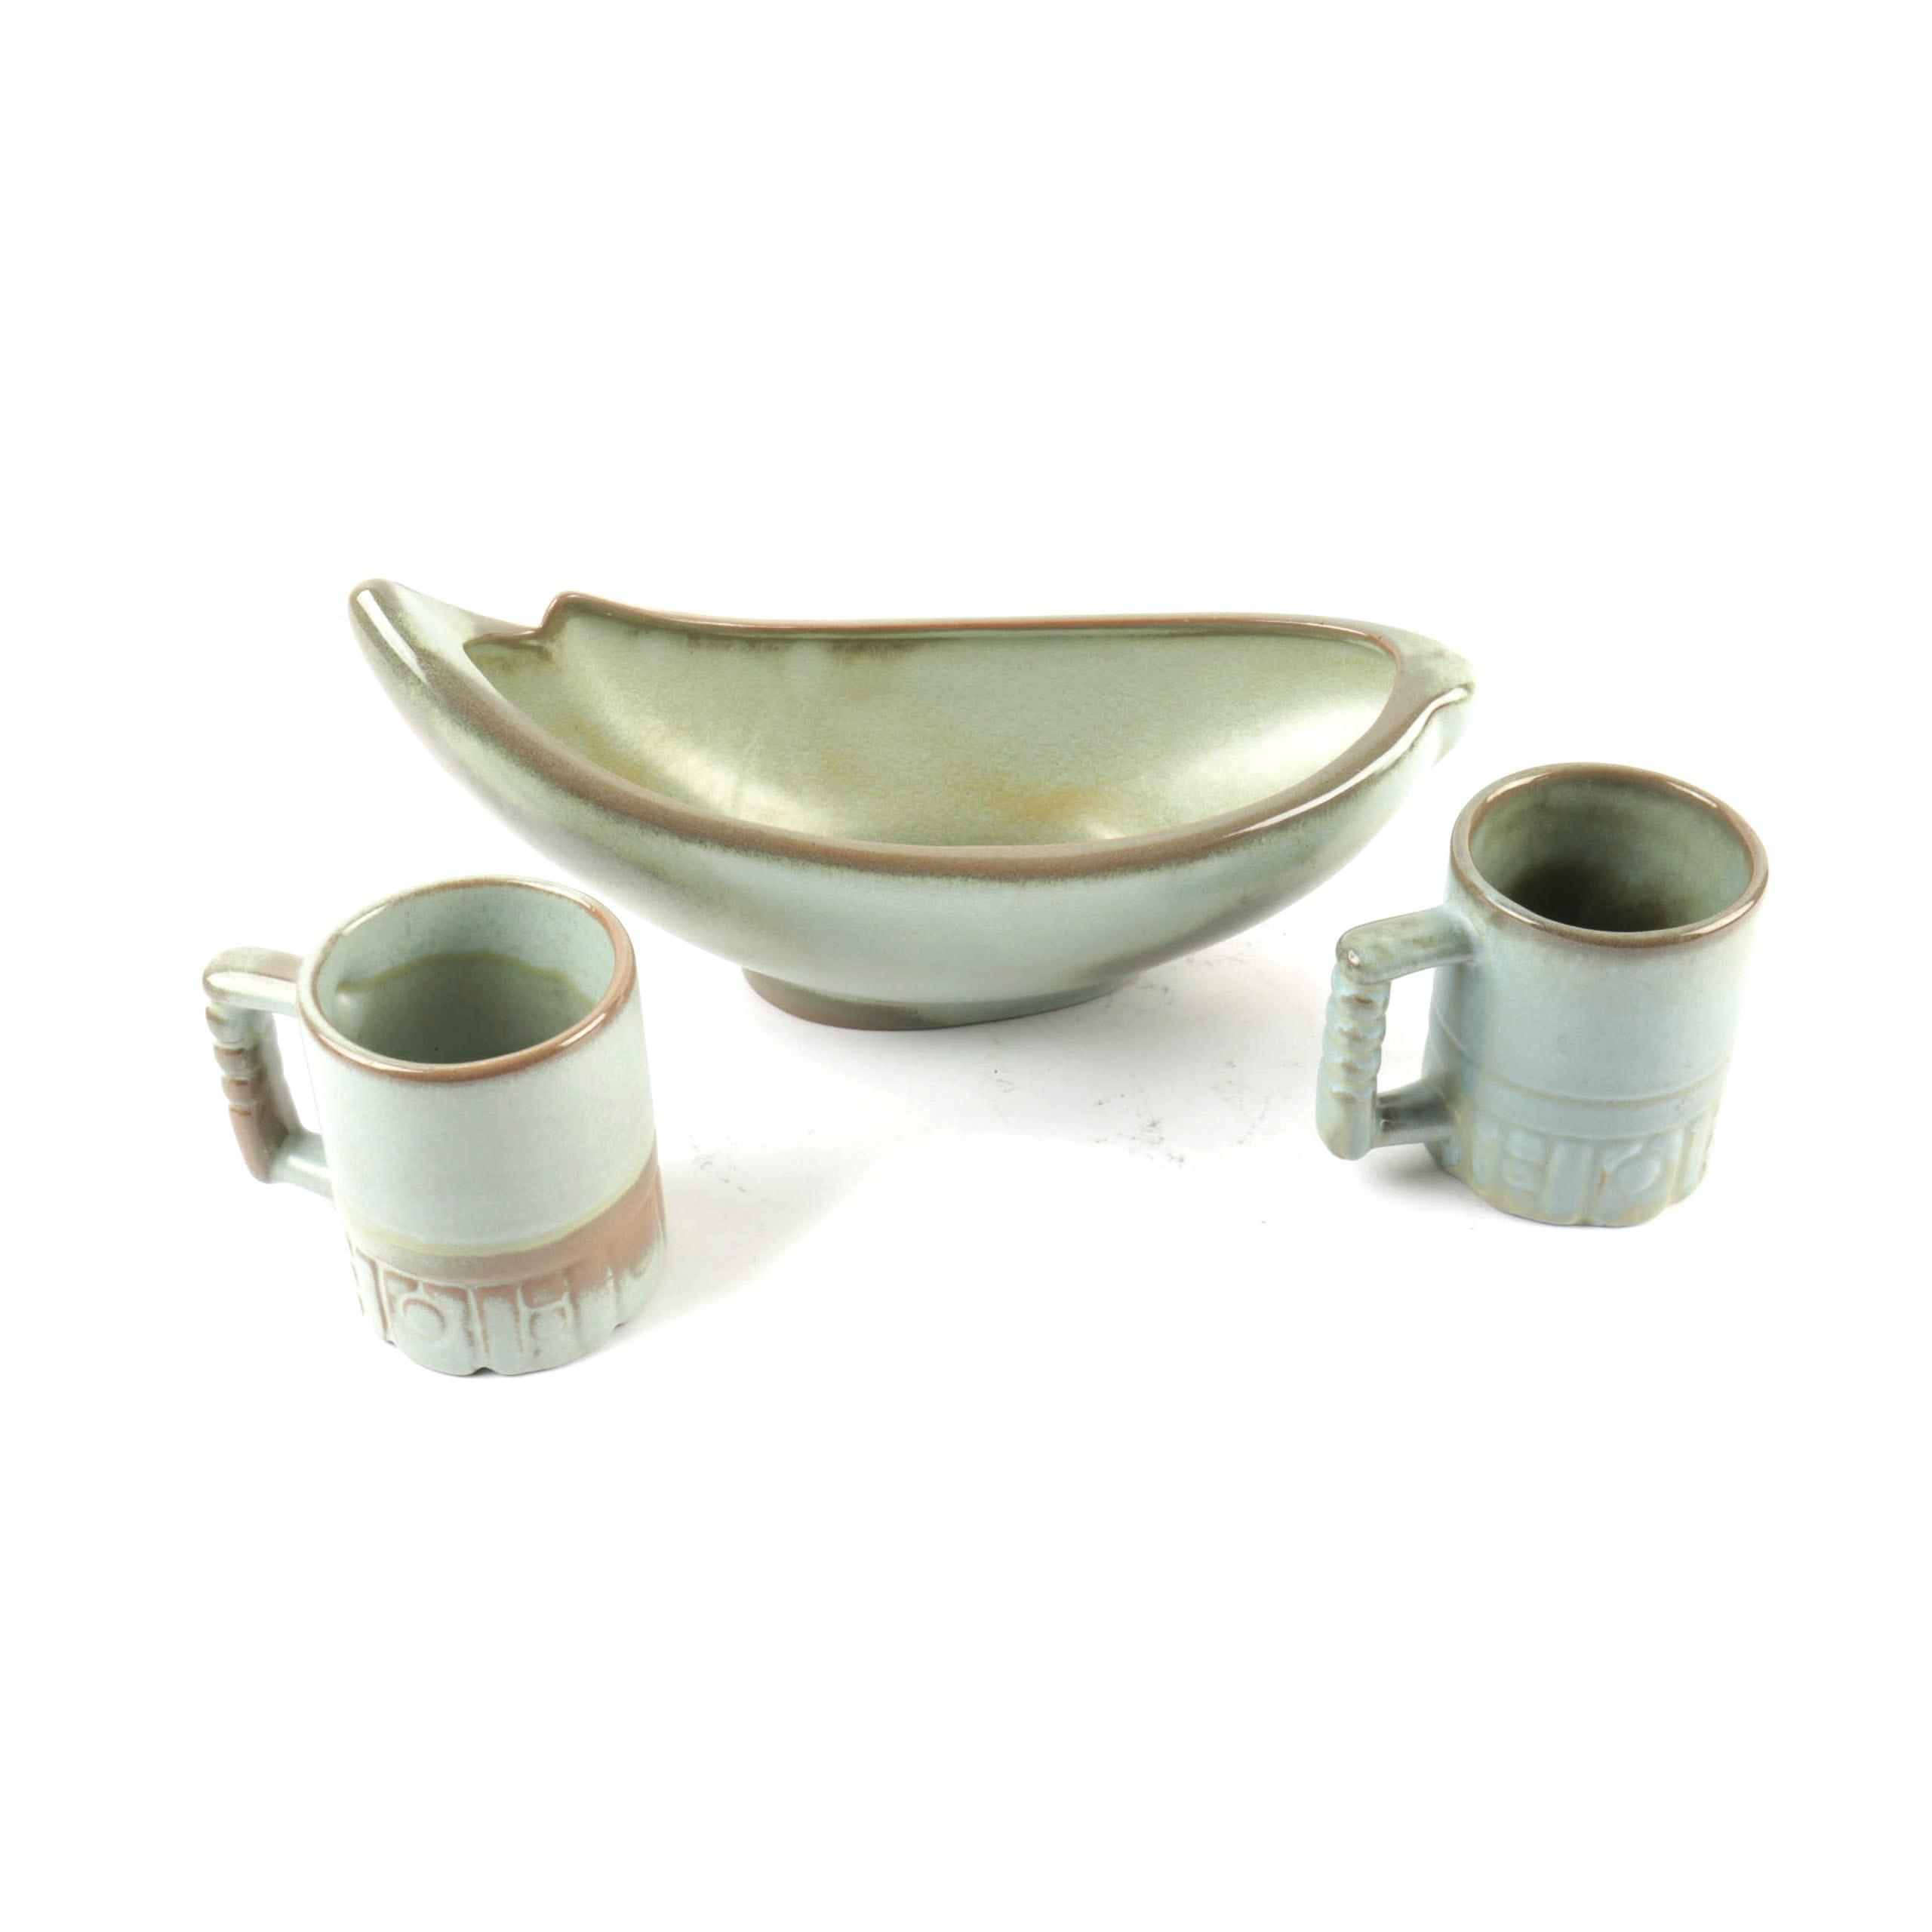 Vintage Frankoma Pottery in Prairie Green ...  sc 1 st  EBTH.com & Vintage Frankoma Pottery in Prairie Green : EBTH